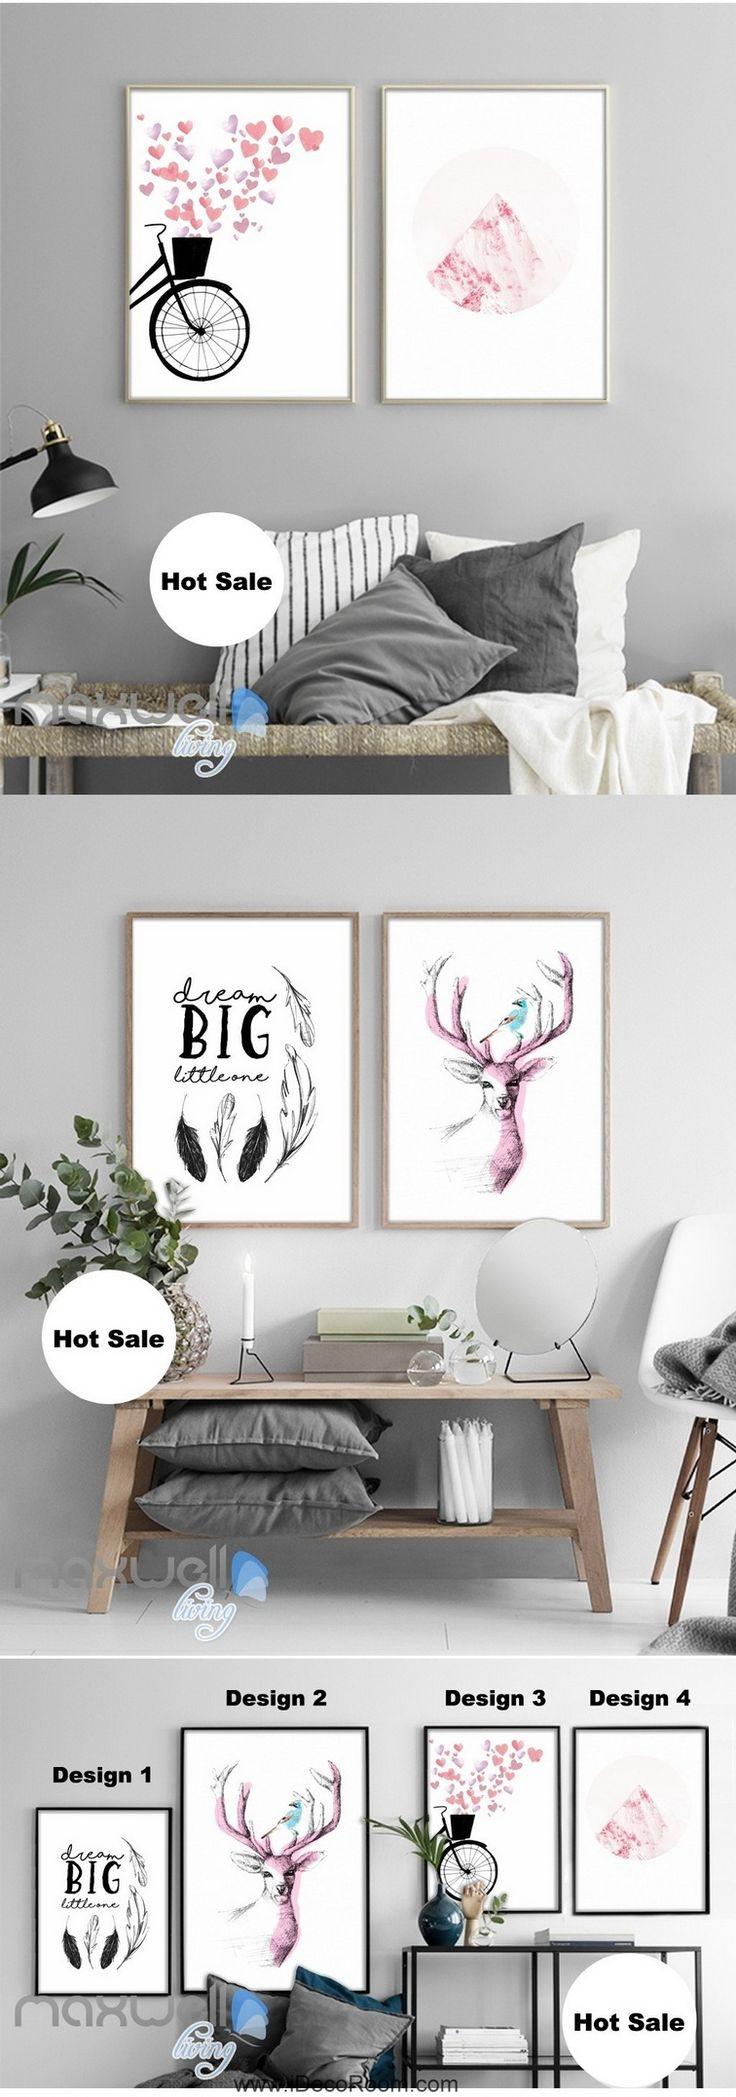 Watercolor Deer Head Bird Heart Dream Big Canvas Prints Wall Art Decals Unframed IDCCV-BO-000022